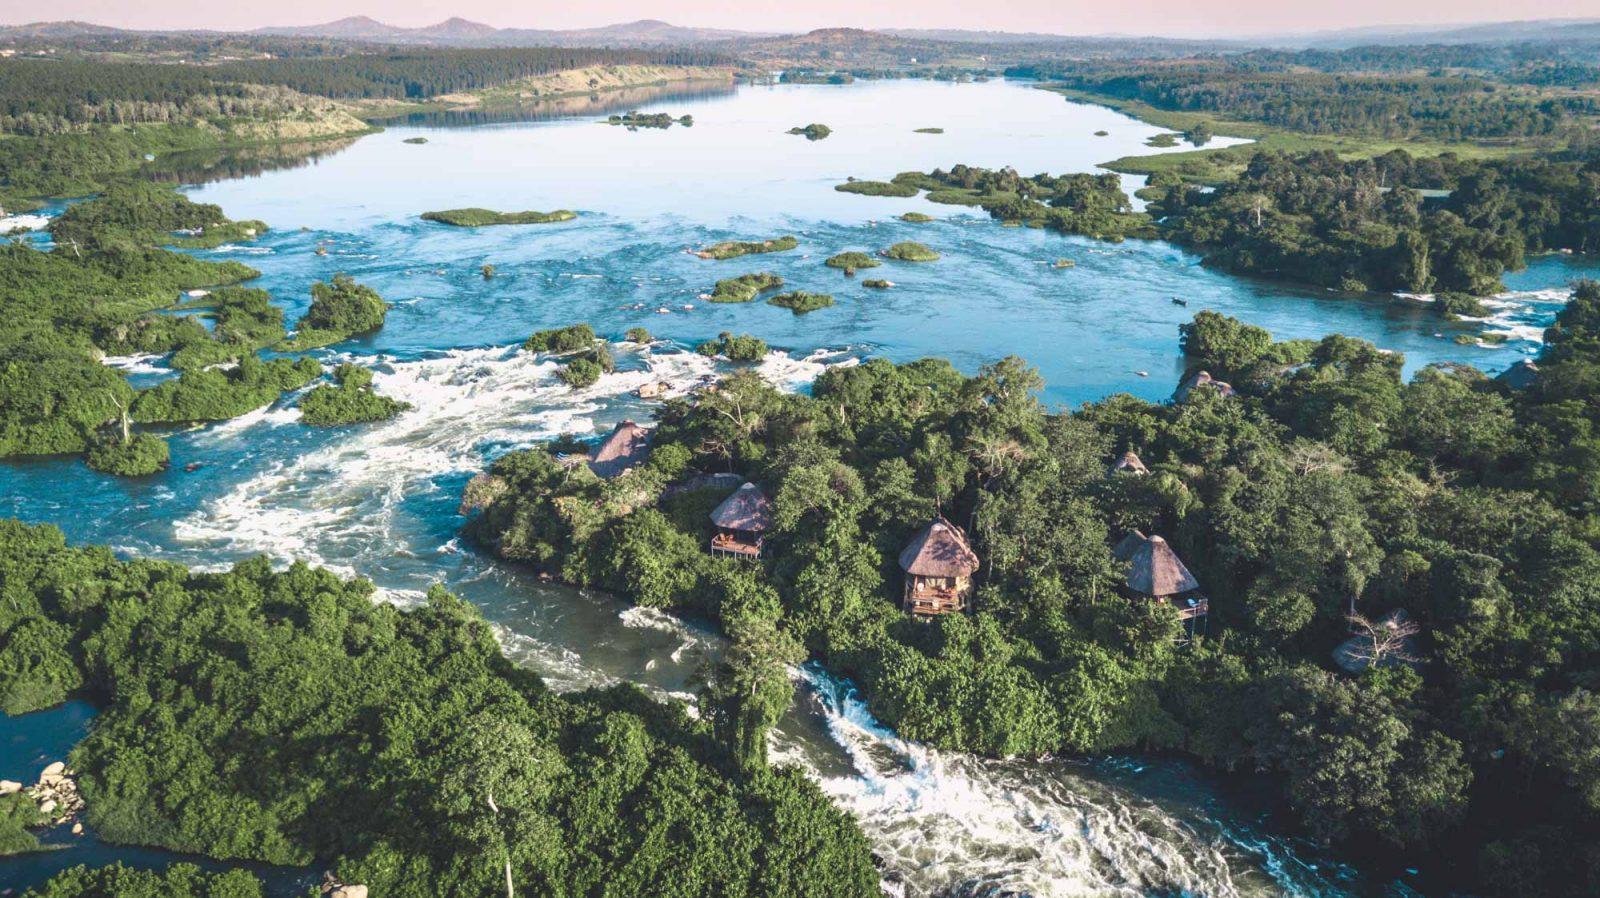 The source of the Nile River, Jinja, Southern Uganda